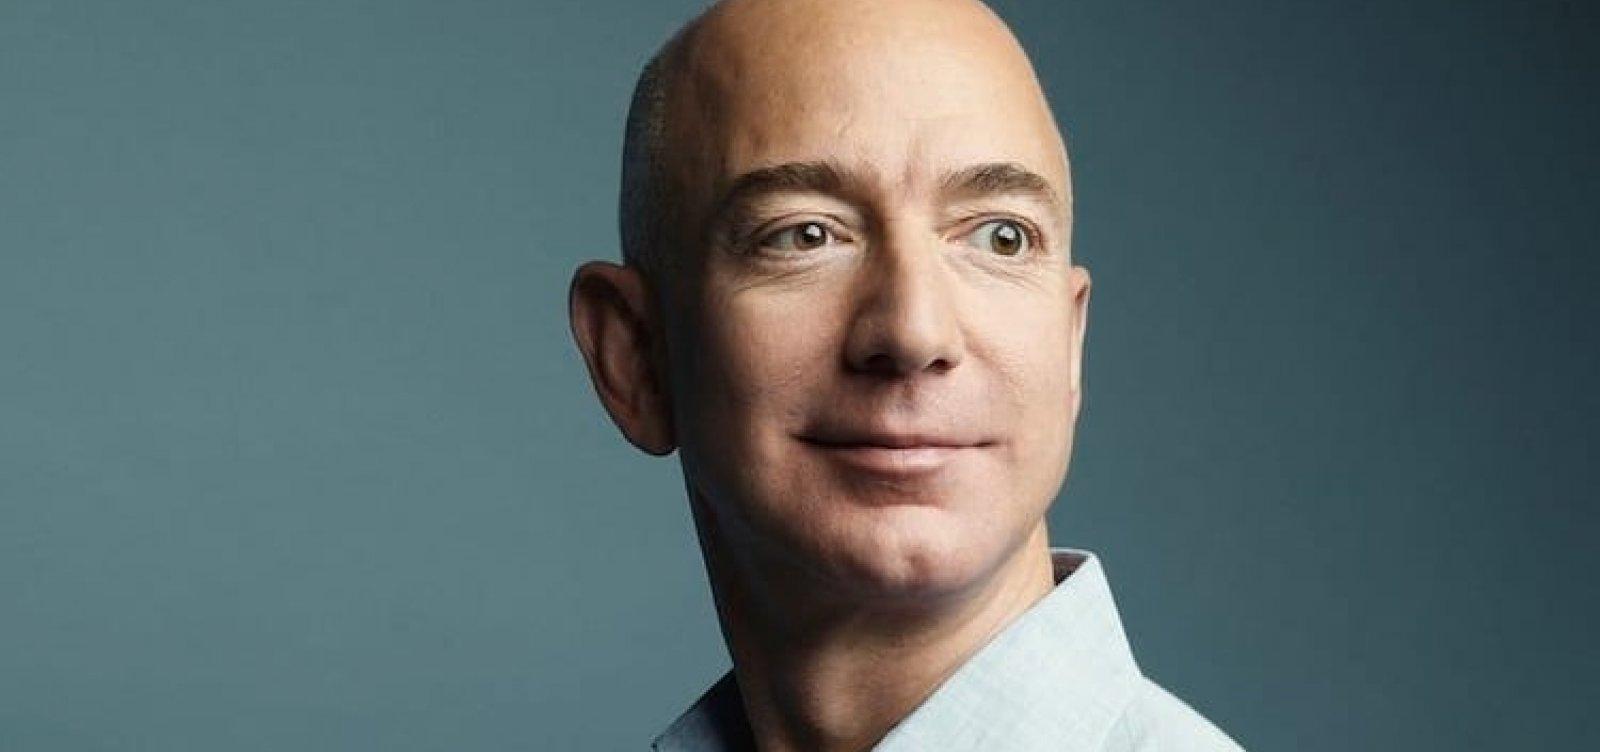 Dono da Amazon supera Bill Gates e vira o mais rico nos EUA